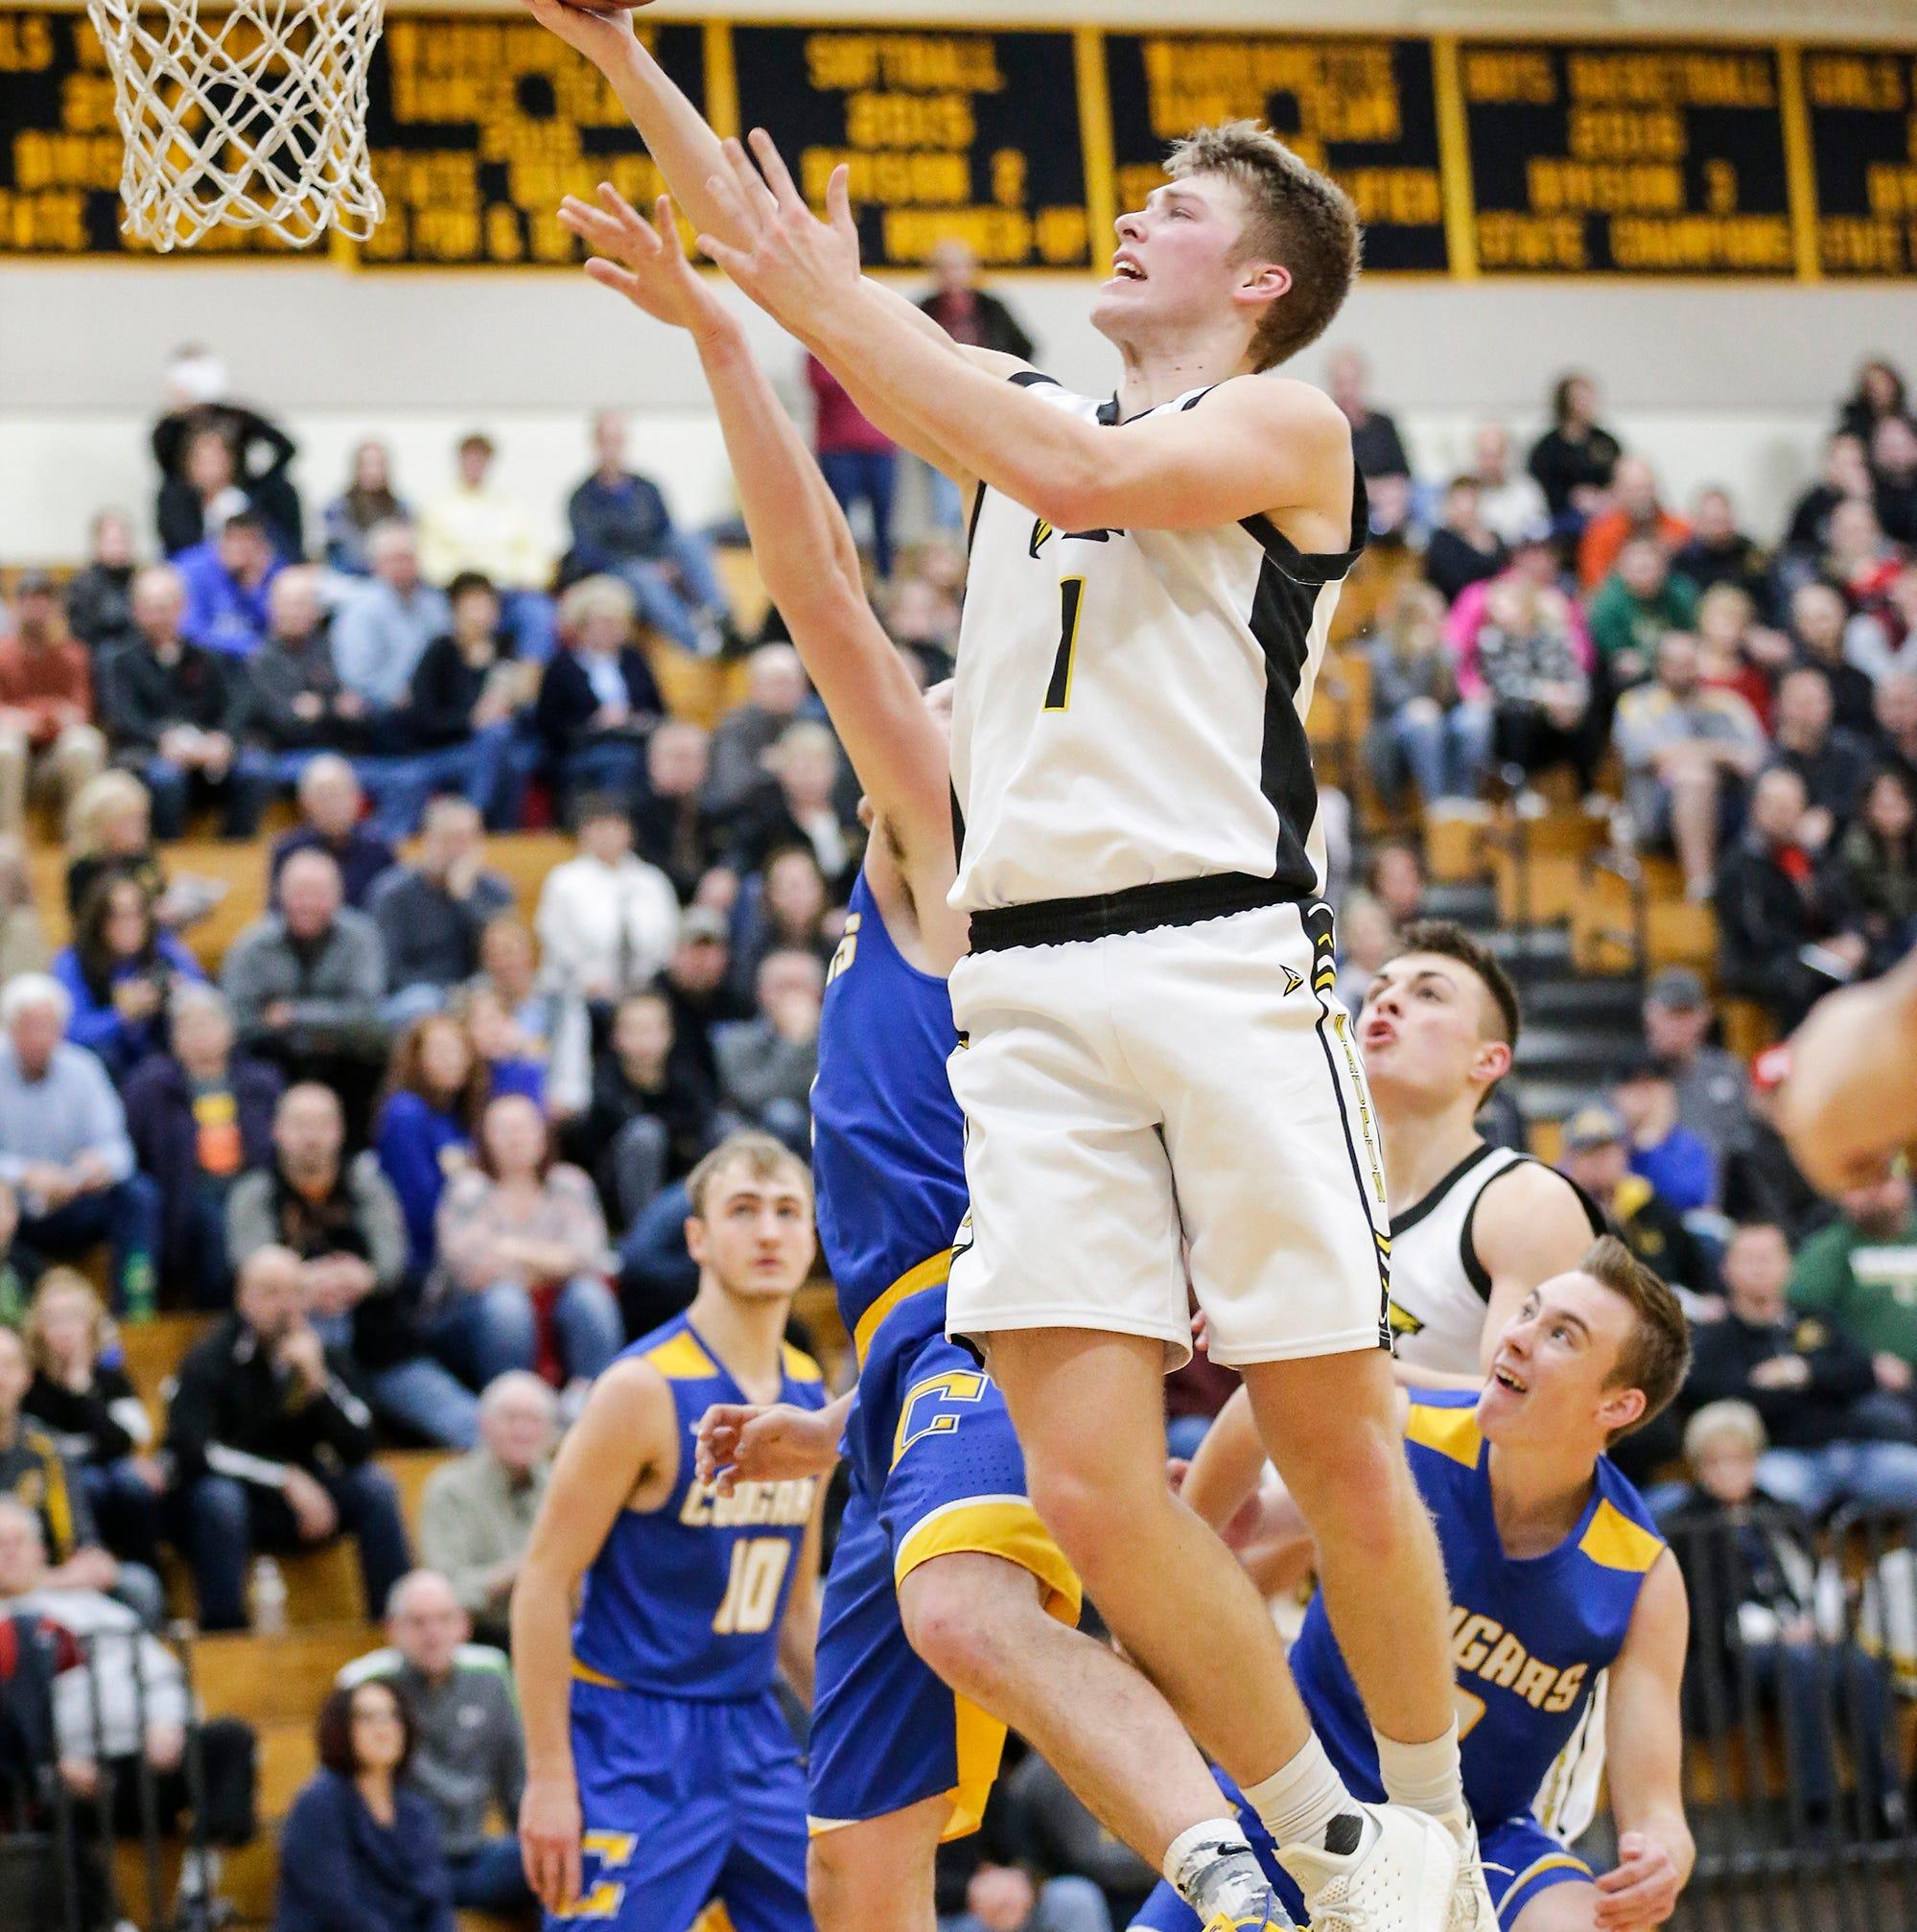 High school basketball: Local seniors achieve milestone moments in careers